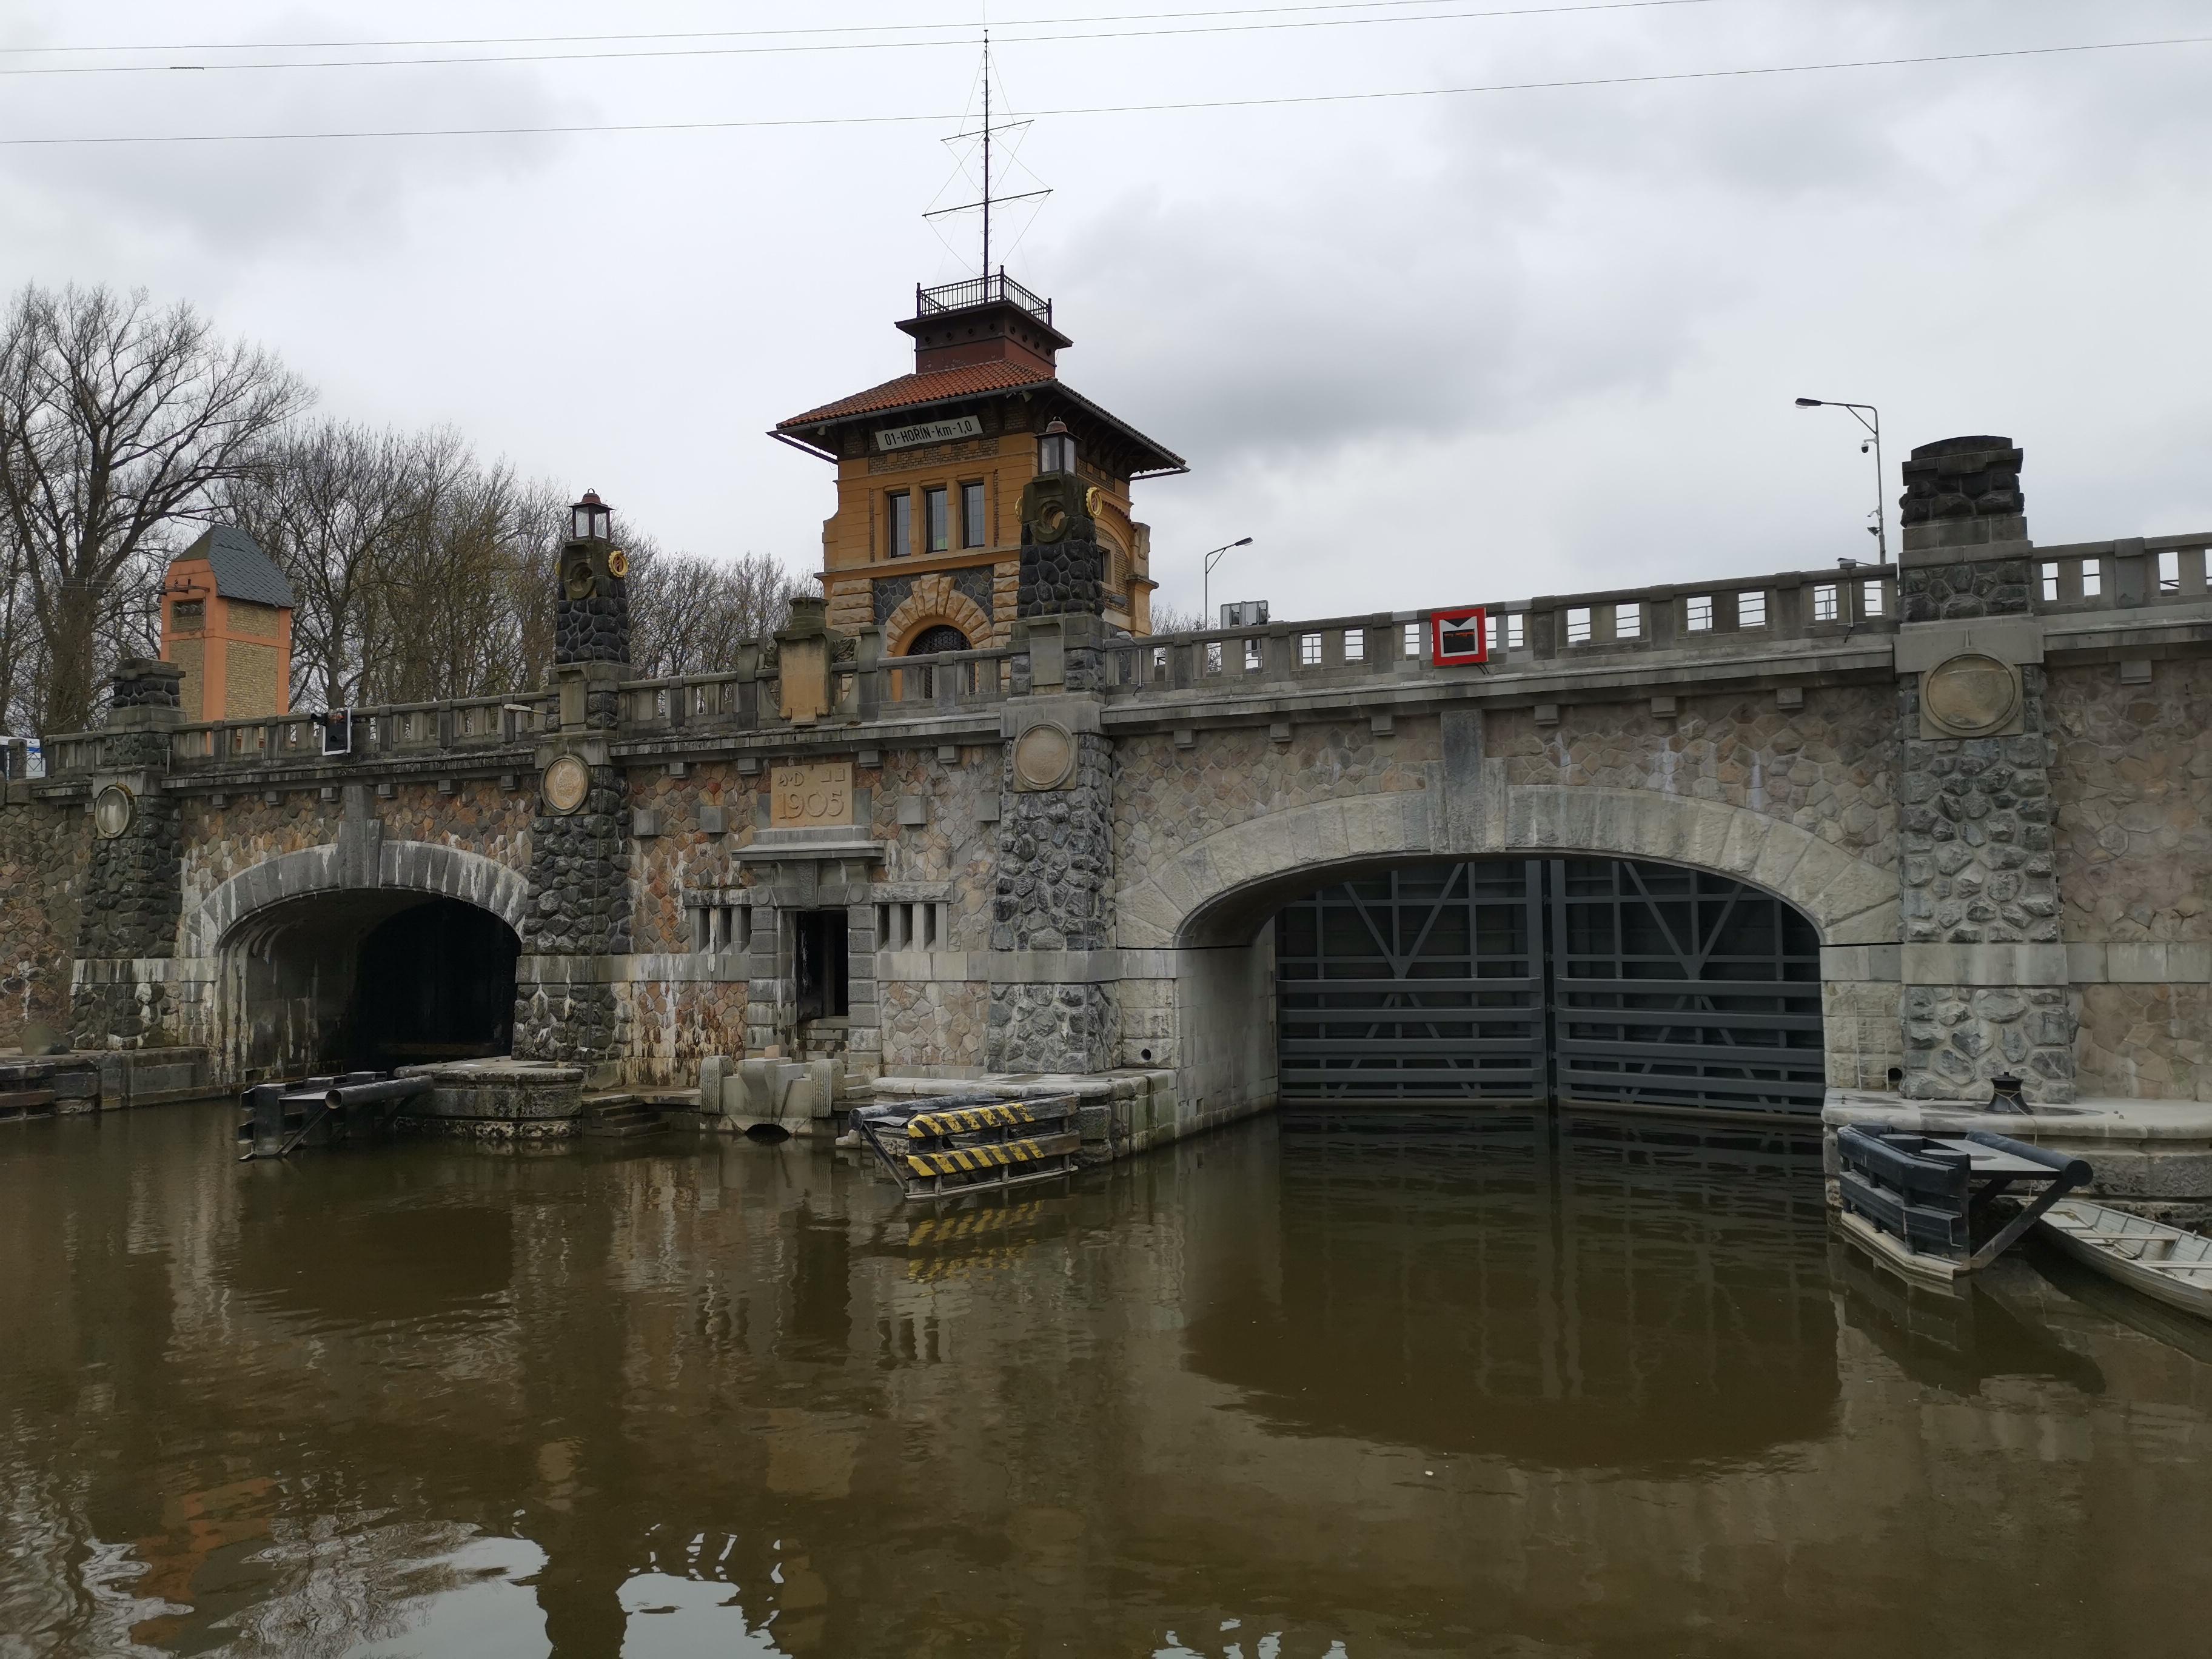 TZ-Unikatni-kamenny-most-pres-plavebni-komoru-v-Horine-se-poprve-oficialne-zdvihl-1spusteno.jpg